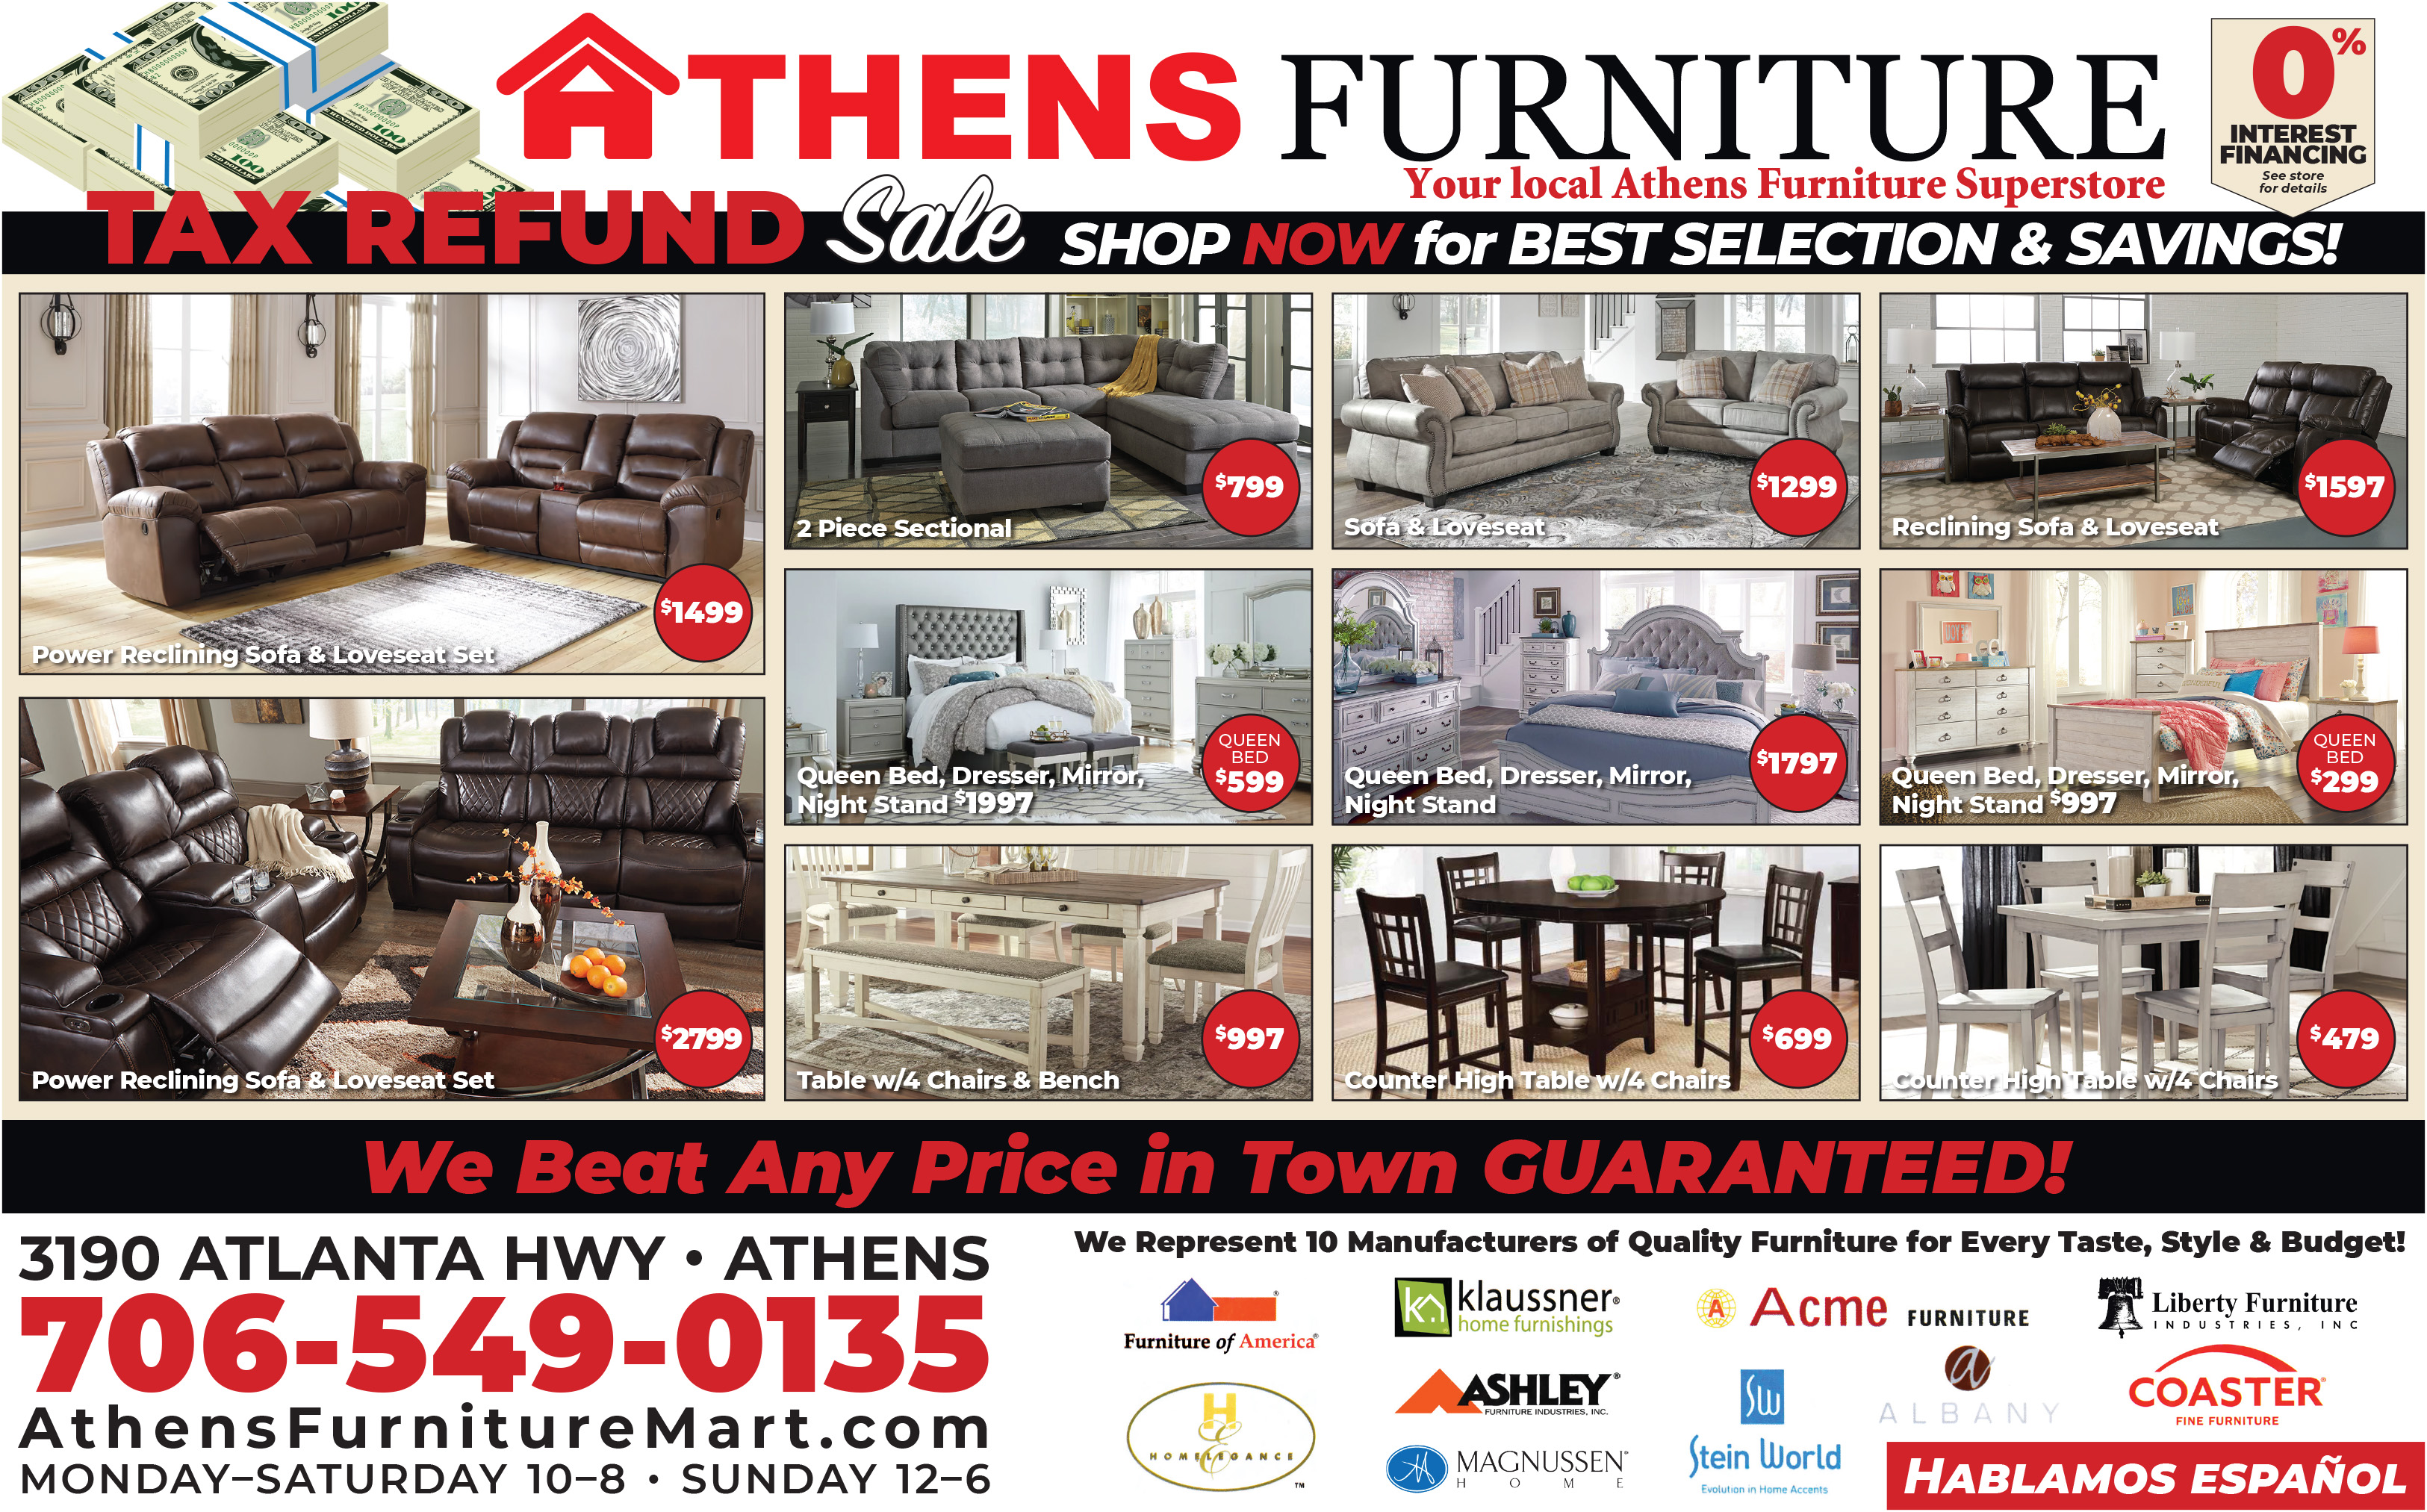 athensfurniture-fullspread-0421